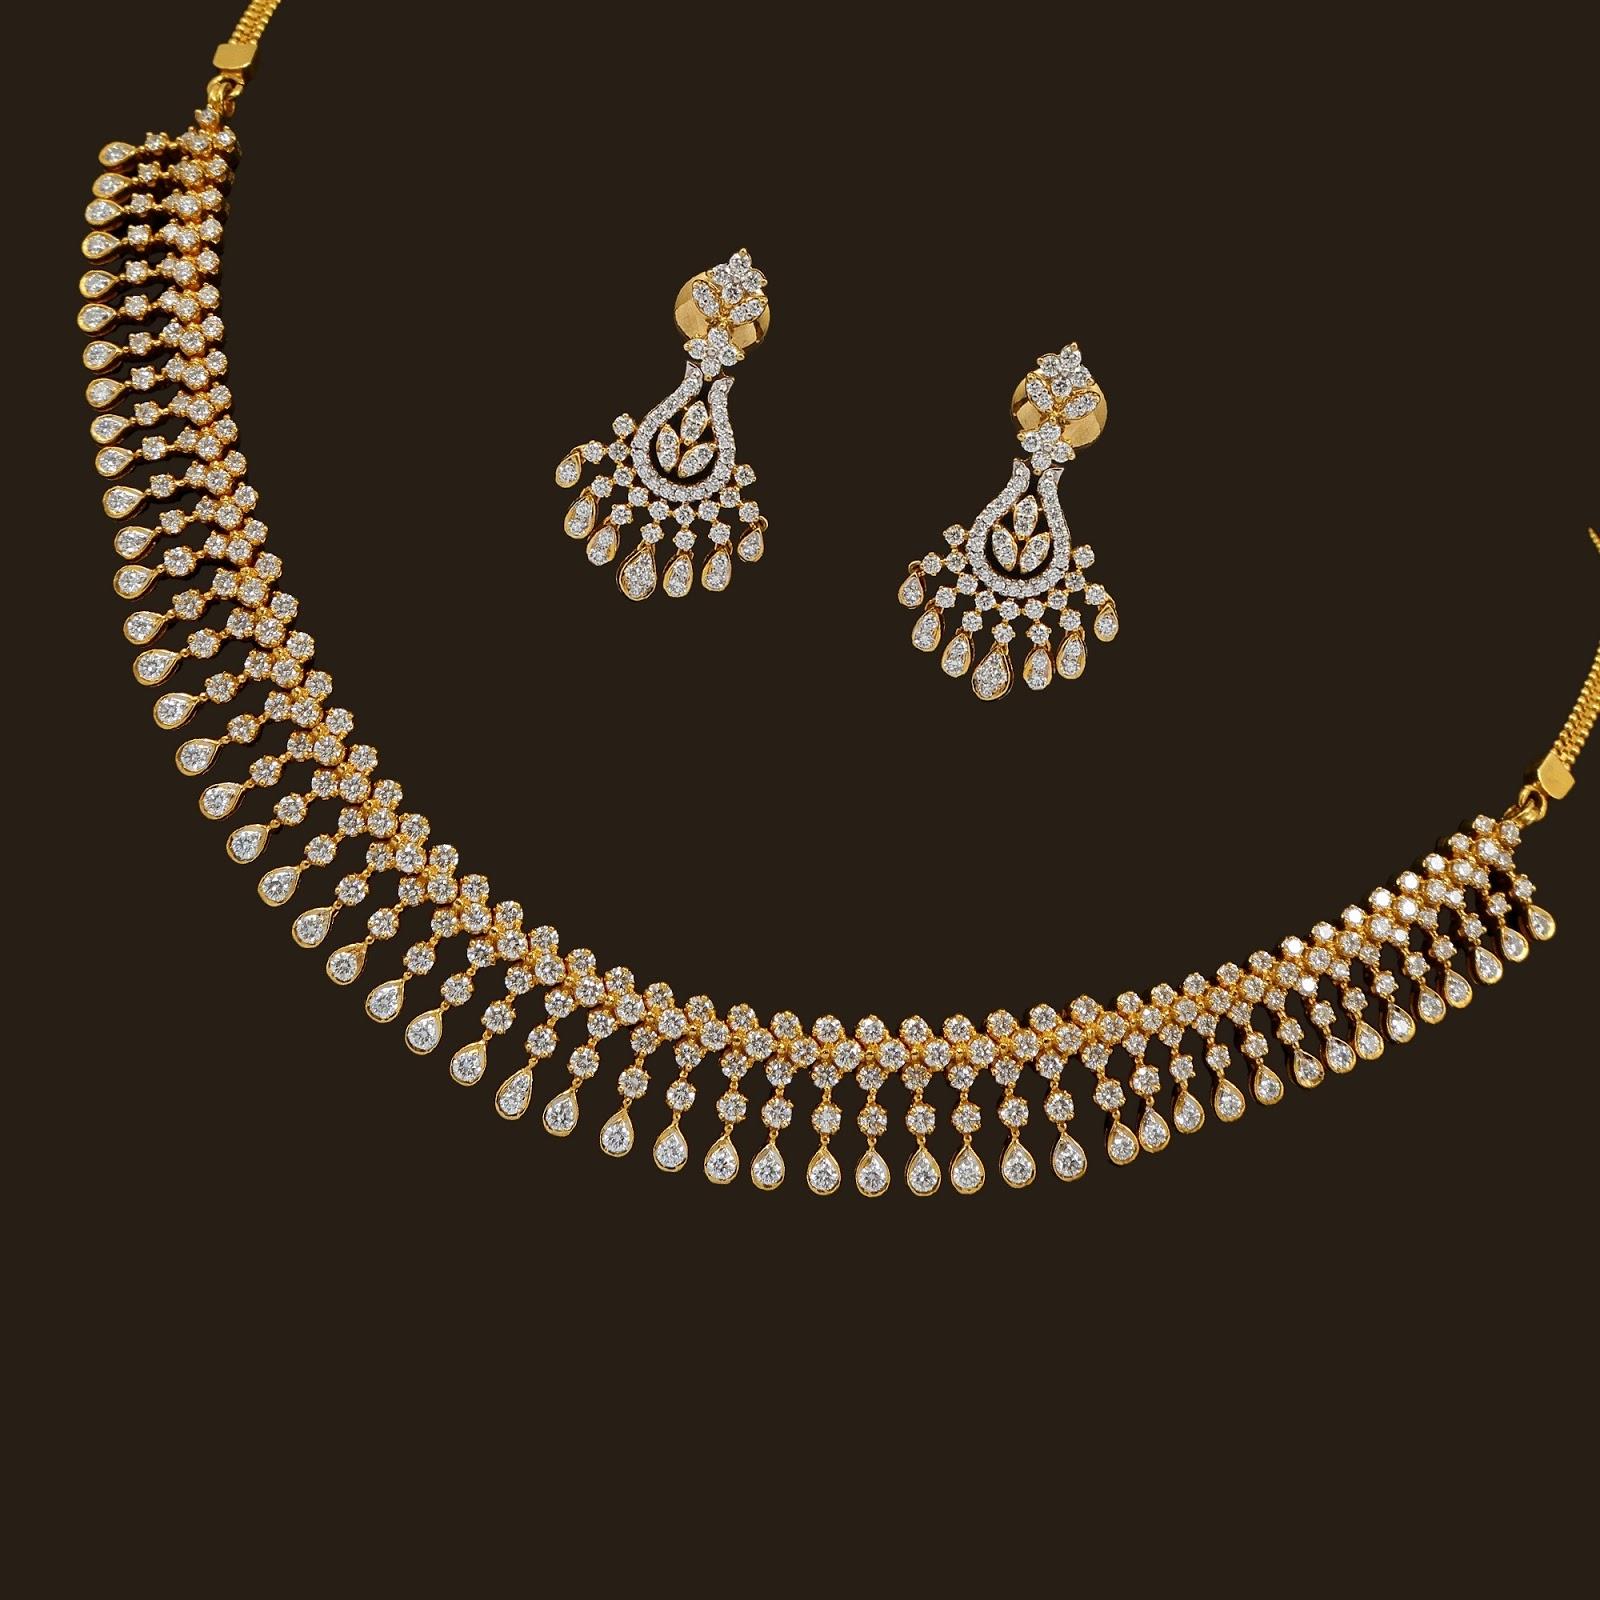 Lulu Online Shopping Sale News And Shopping Details Vummidi Diamond Necklace Sets